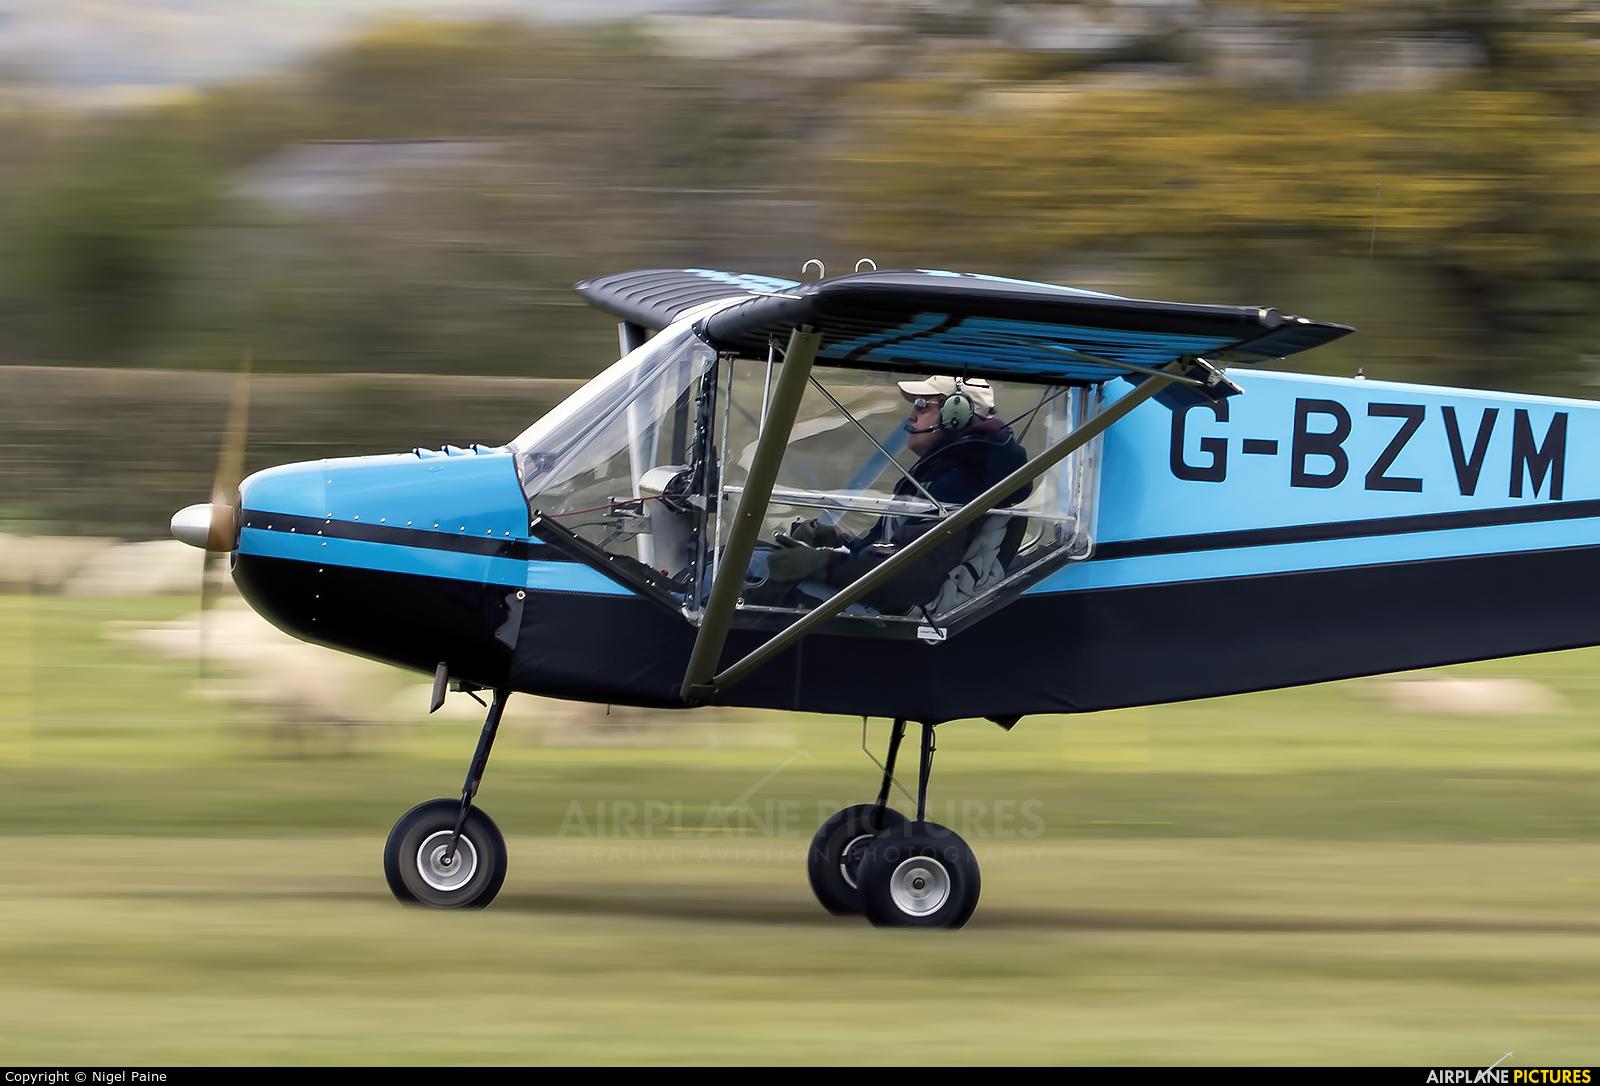 Private G-BZVM aircraft at Lashenden / Headcorn